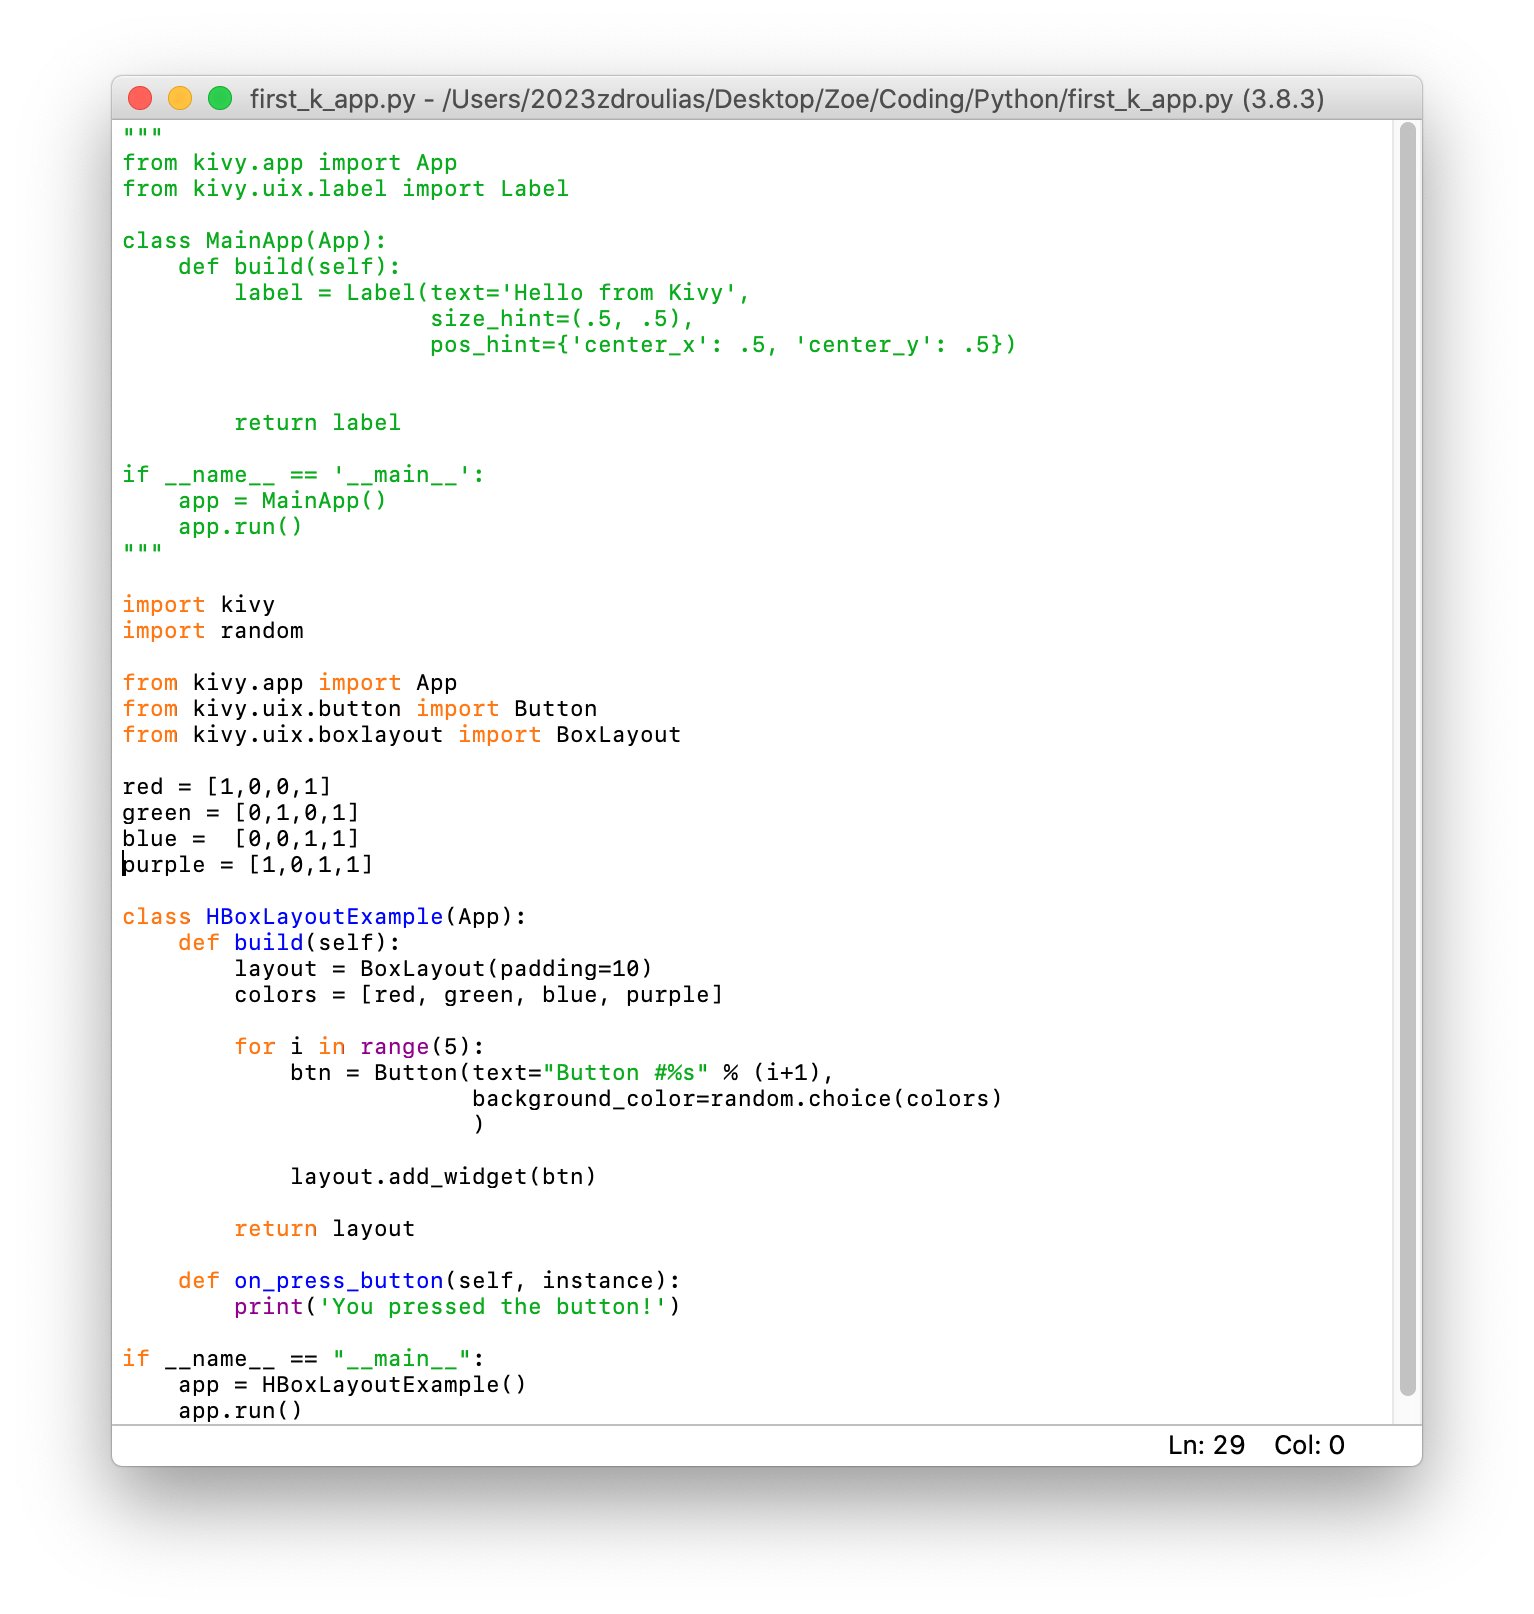 https://cloud-gtk1cfeyn-hack-club-bot.vercel.app/0screen_shot_2021-08-03_at_10.27.32_am.png